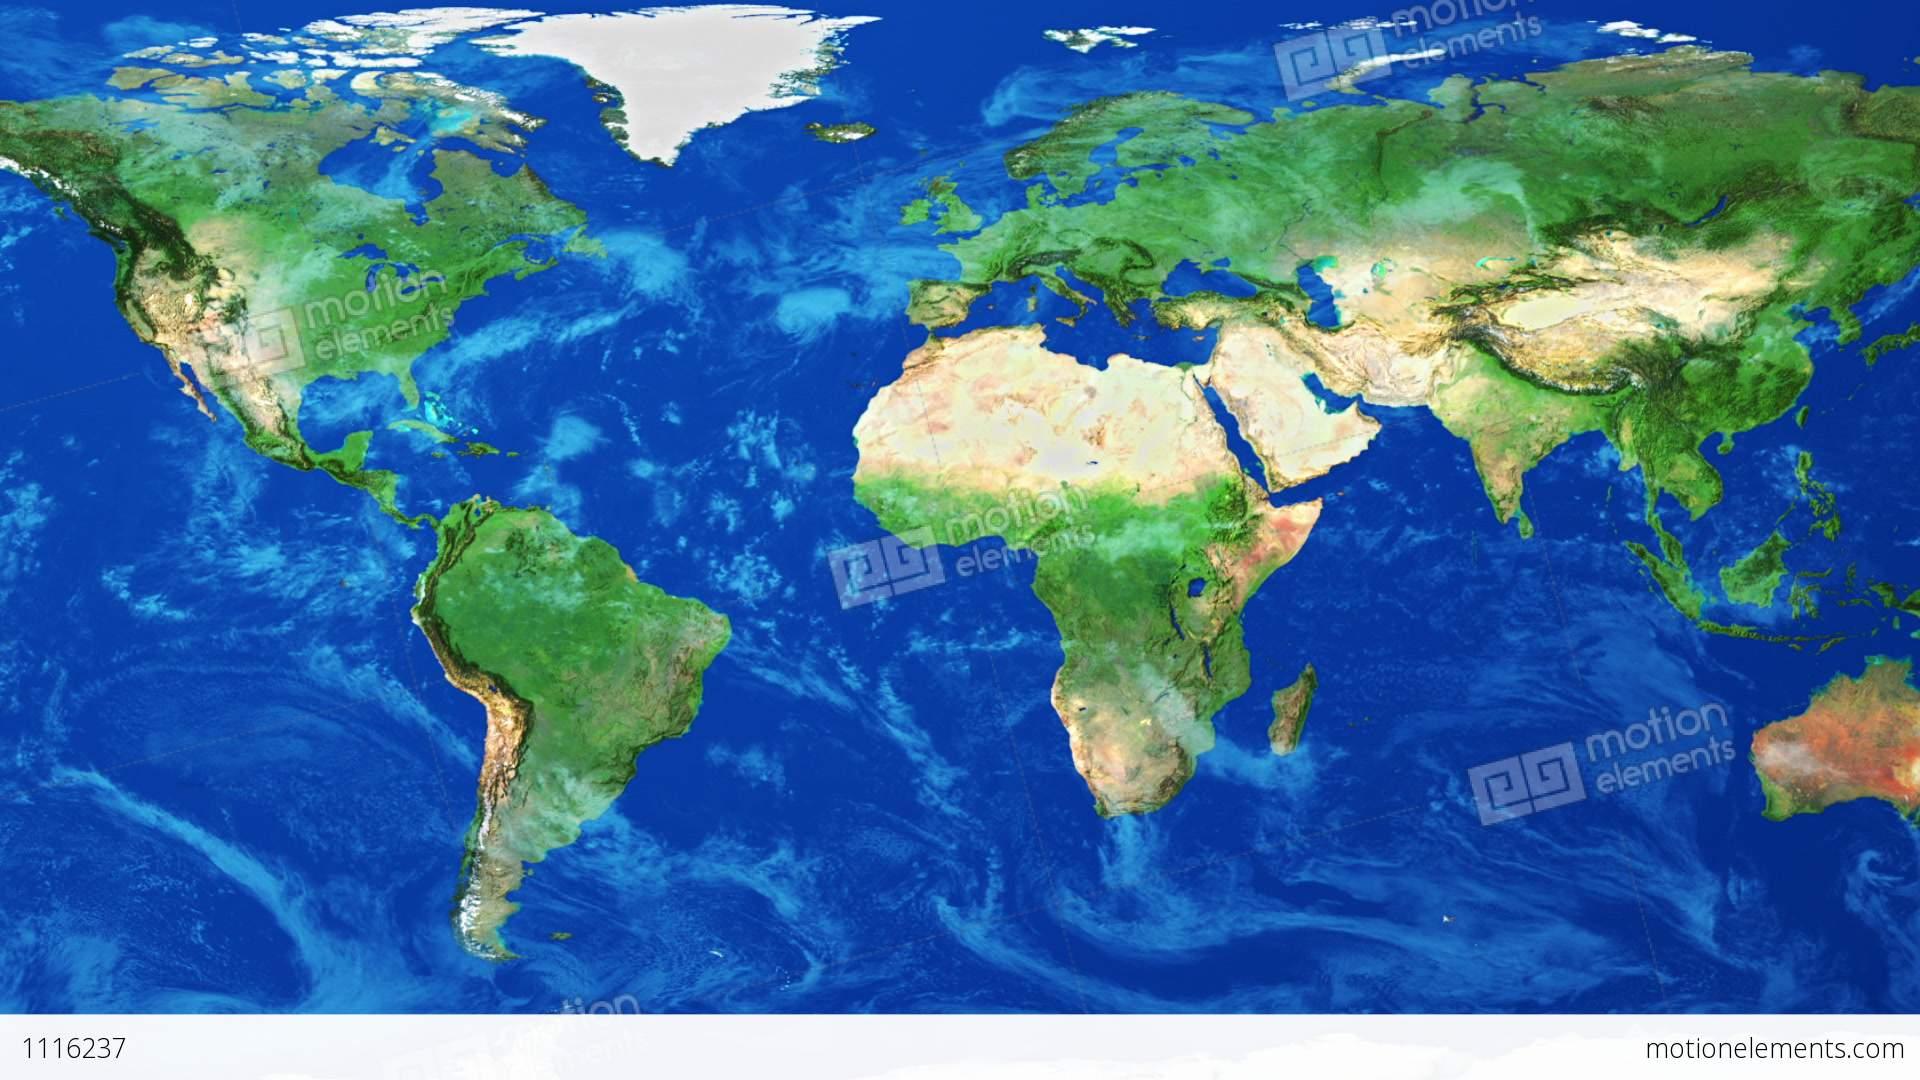 Realistic World Map Wraps To Globe Loop On Black Stock Animation - World map glob